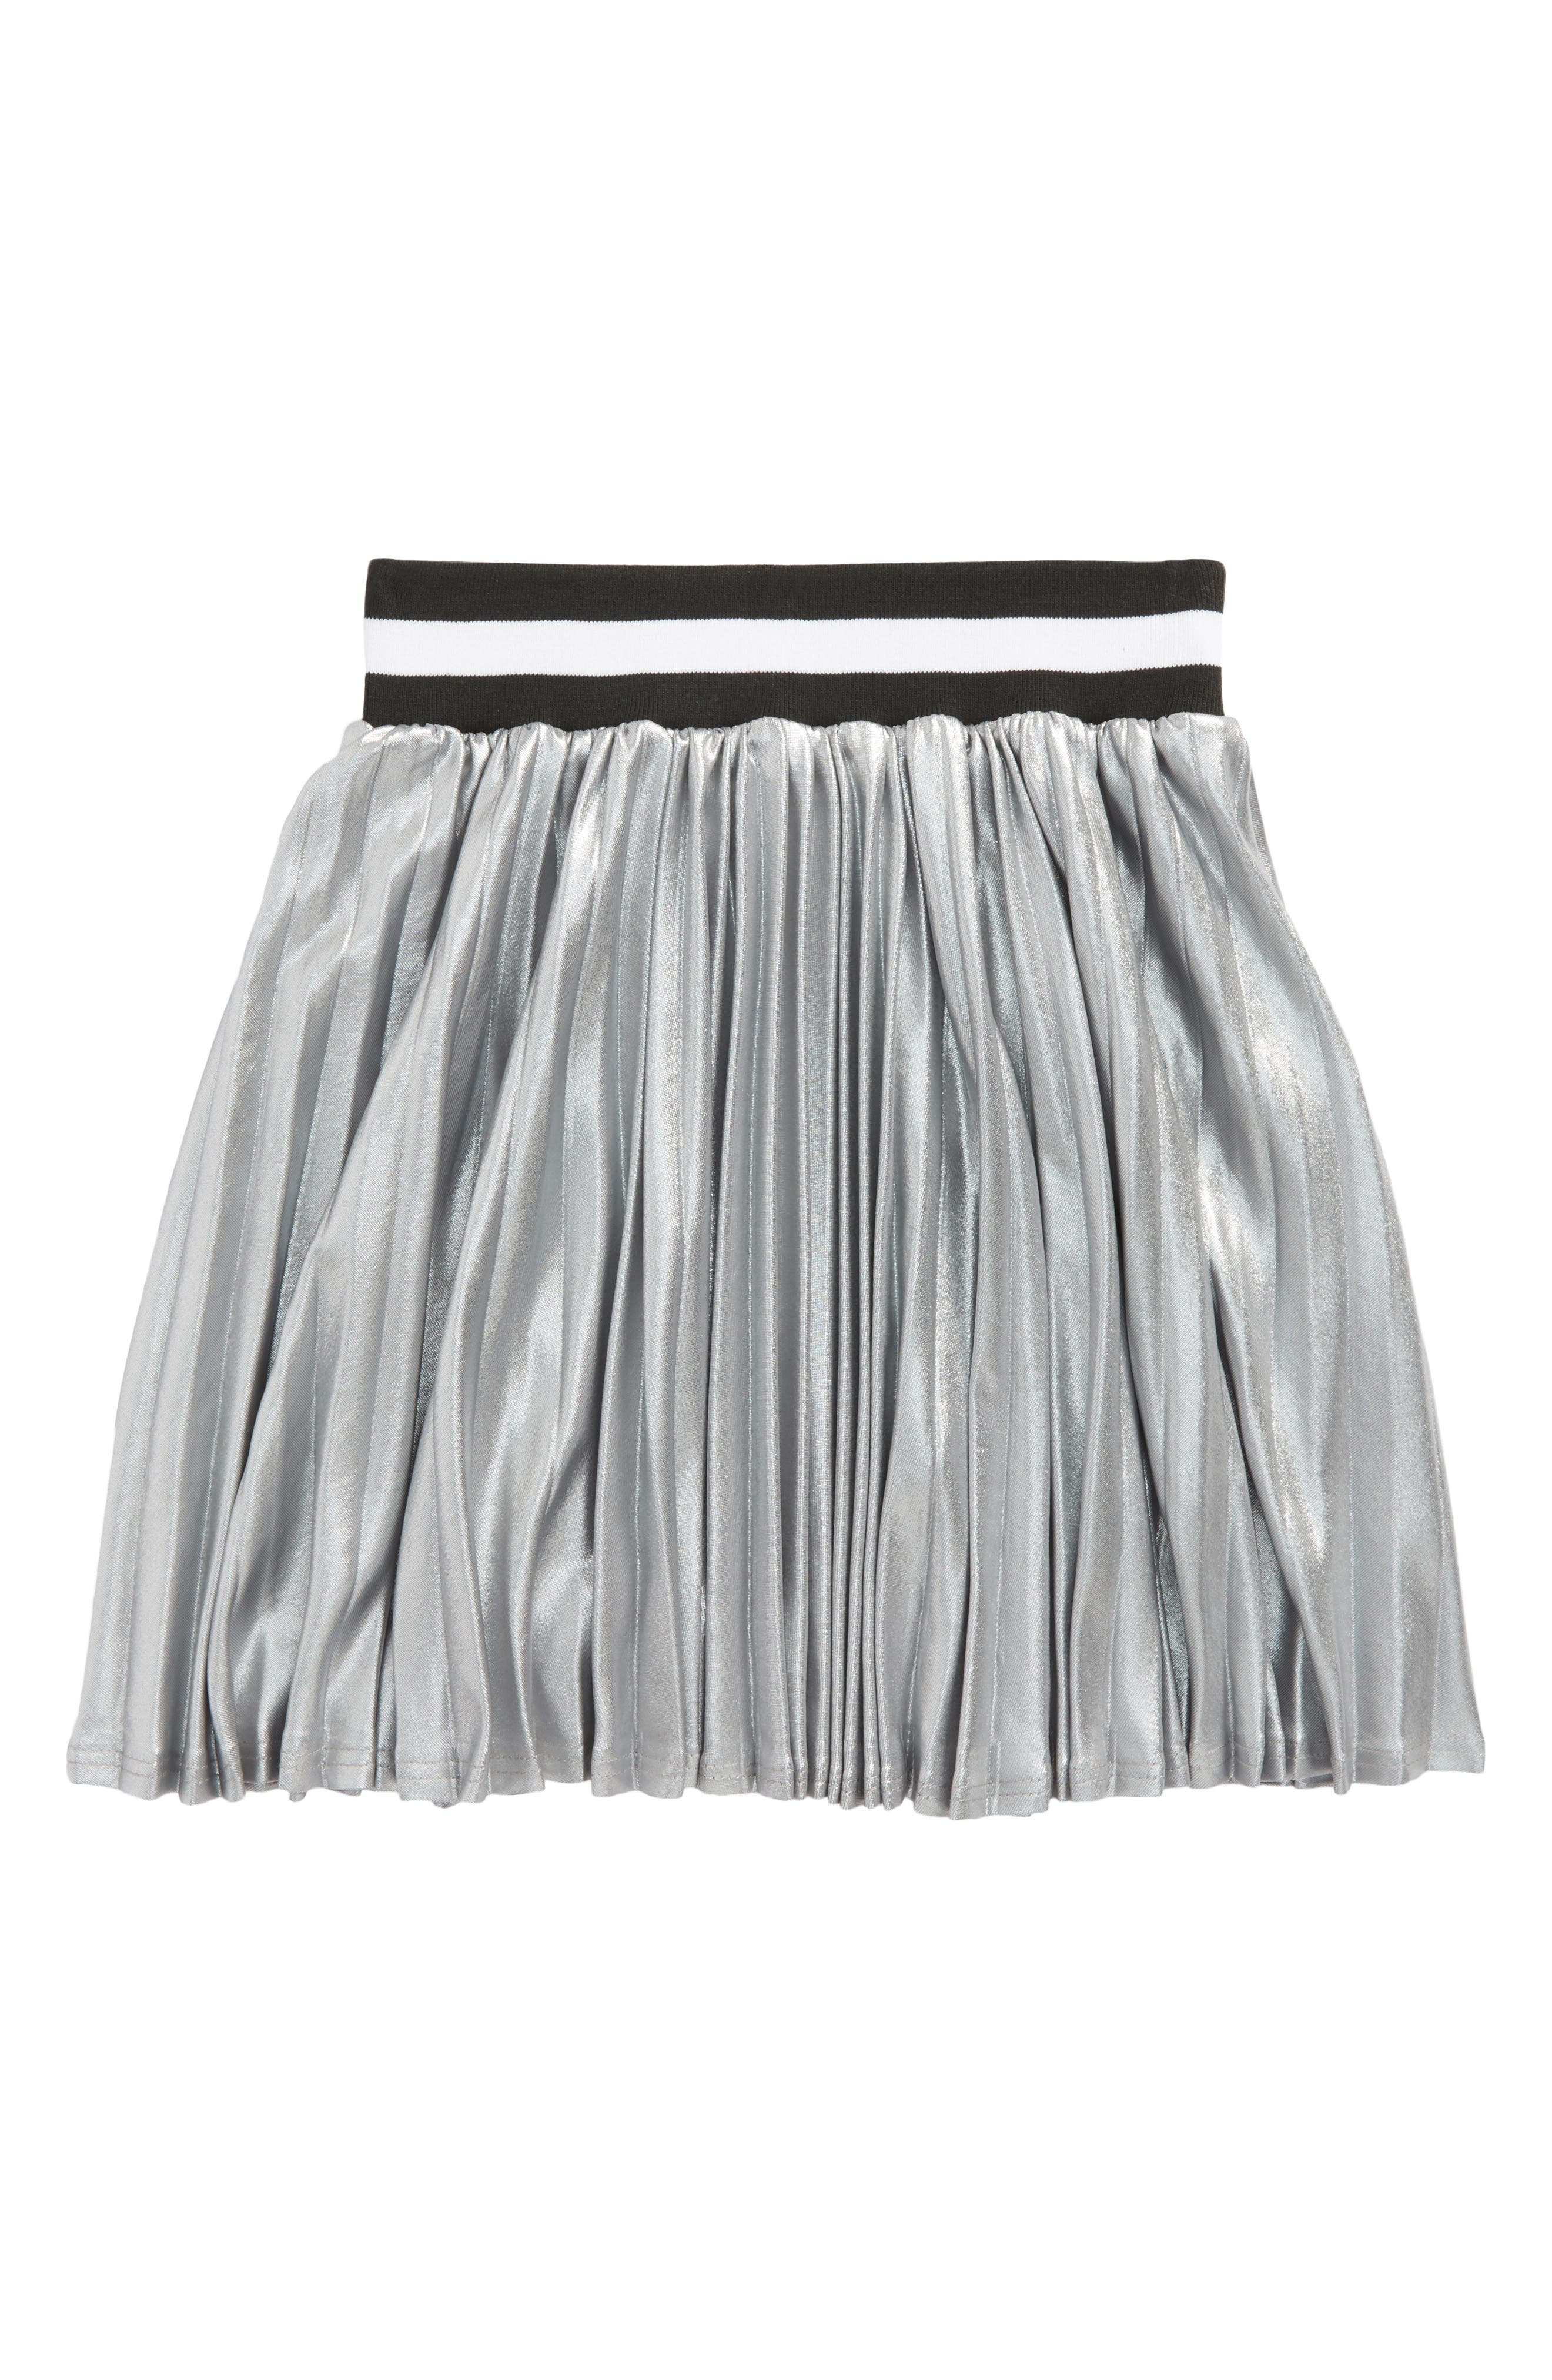 Aly Skirt,                             Main thumbnail 1, color,                             Silver